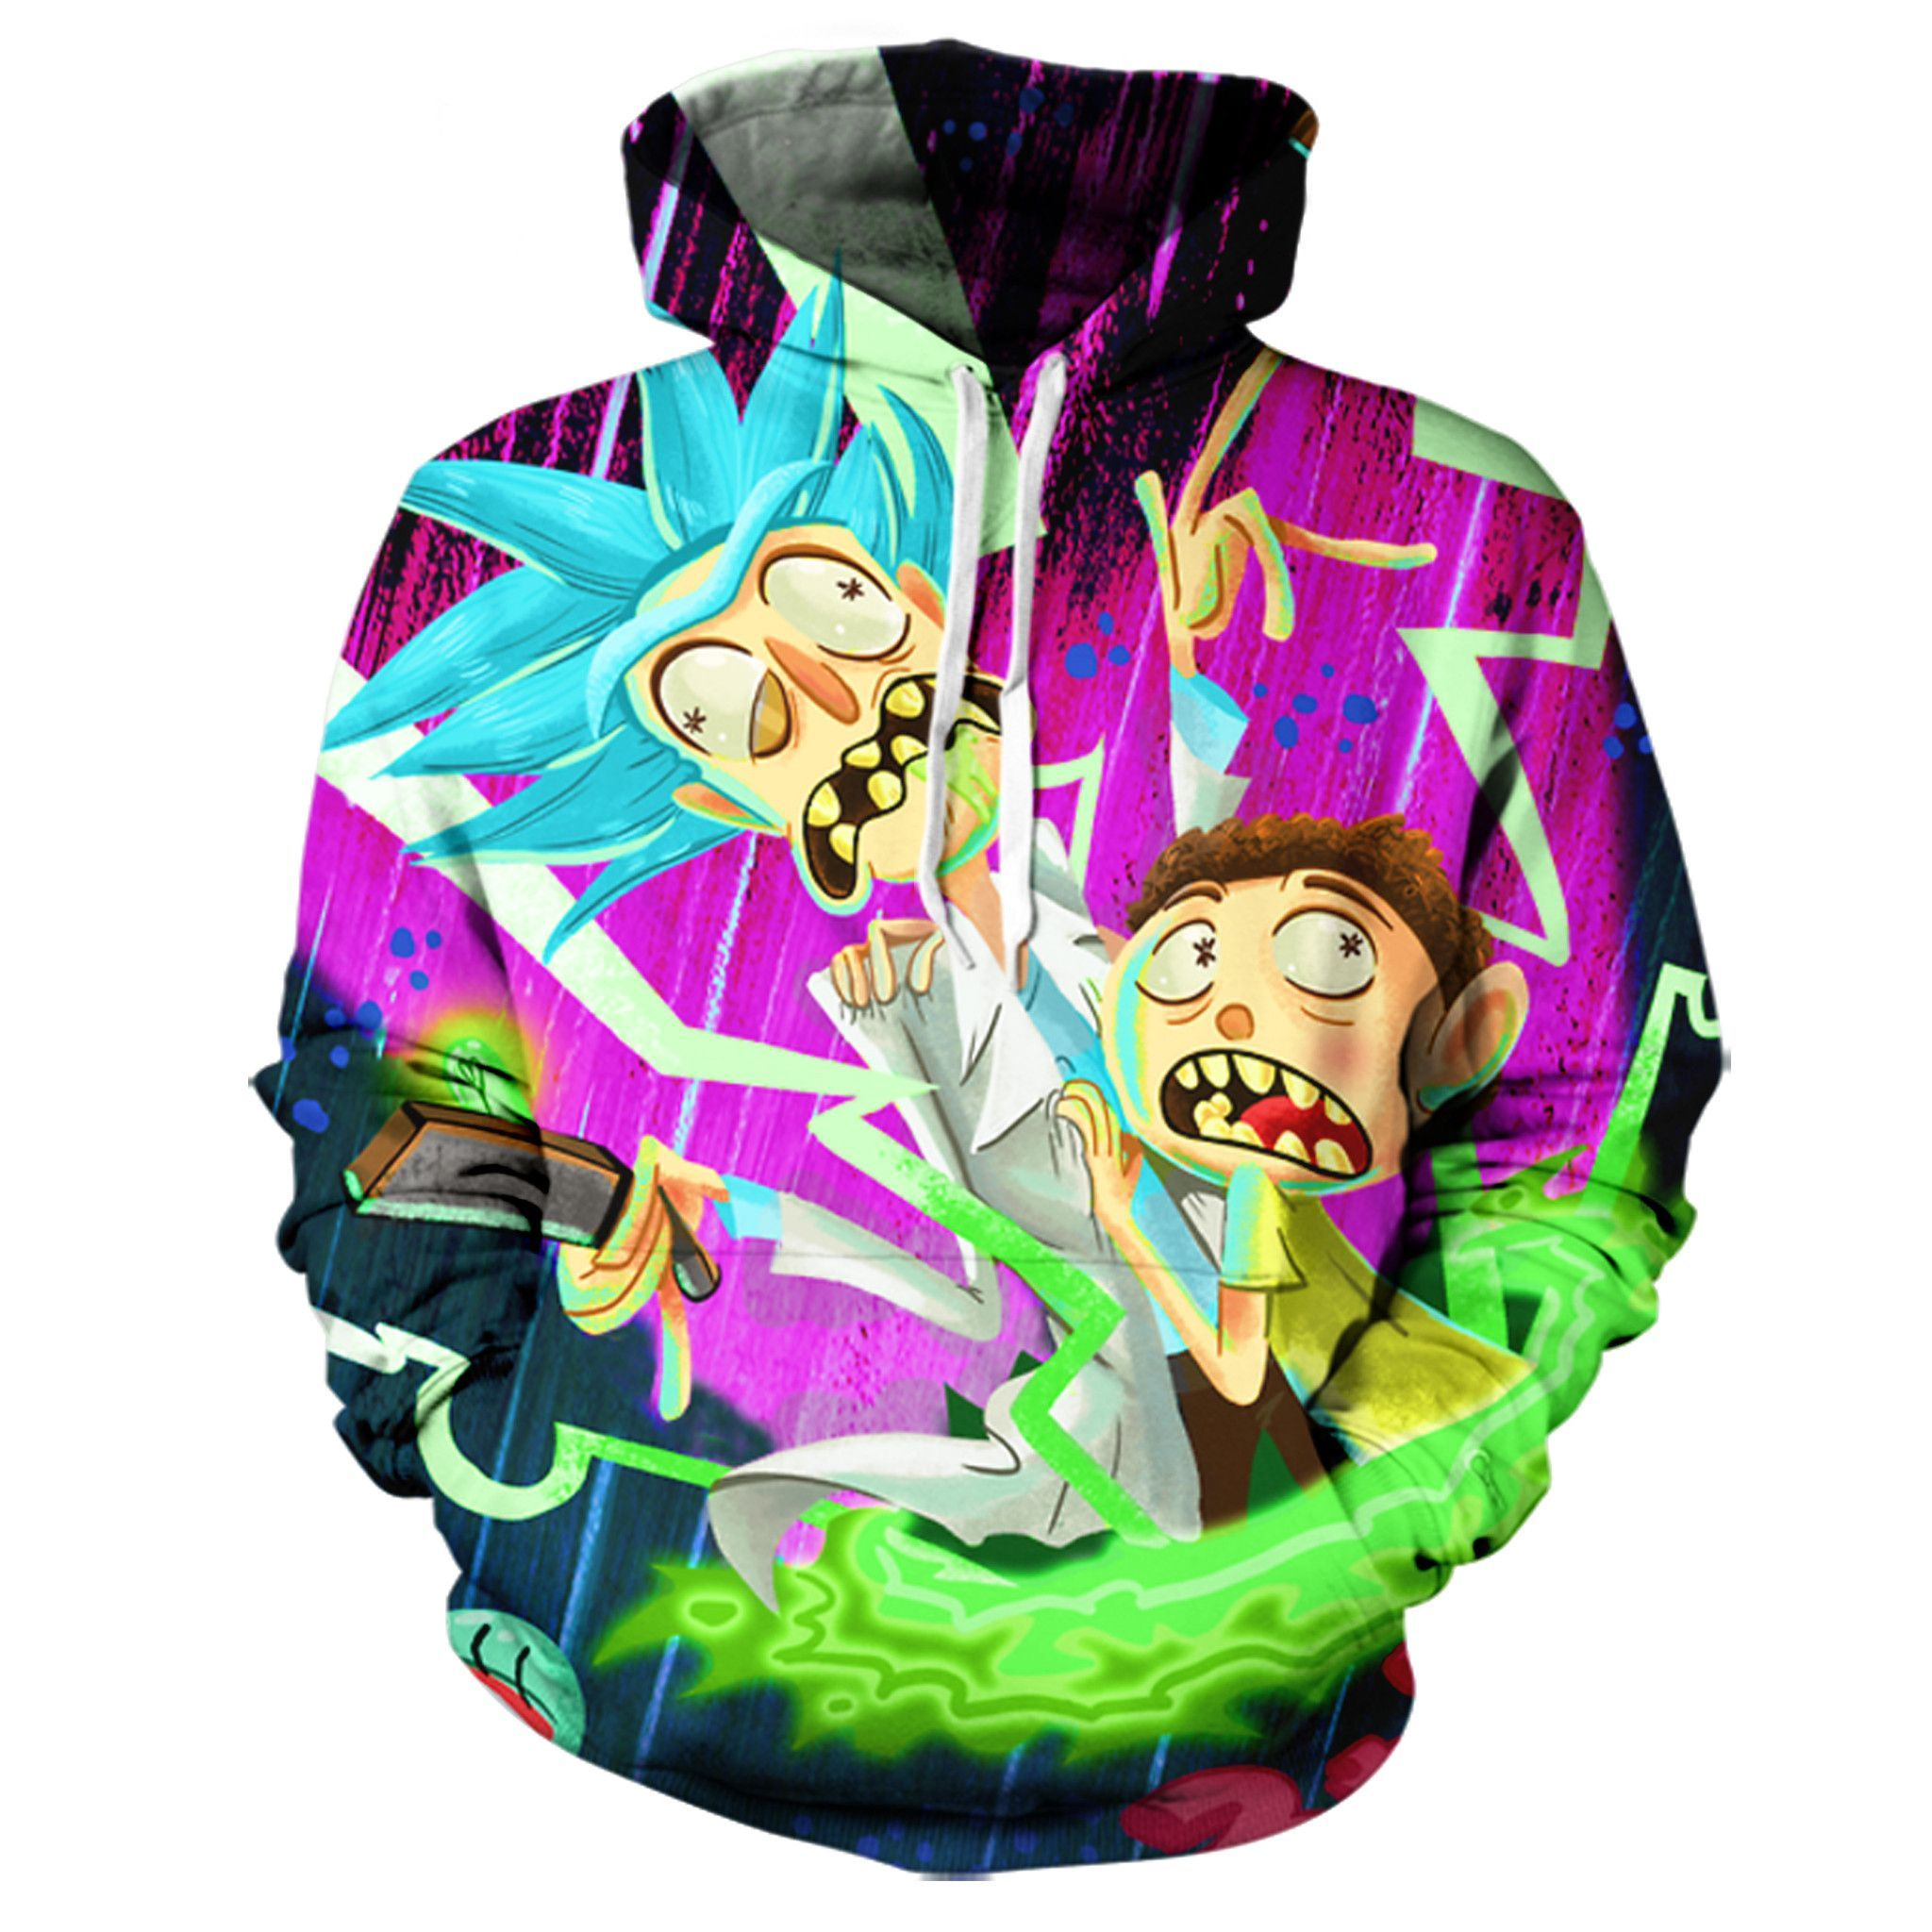 Rick And Morty Hoodie In 2018 Stuff To Buy Pinterest Hoodies Badly Drawn Tshirt Short Circuit Mens Online At Grindstore